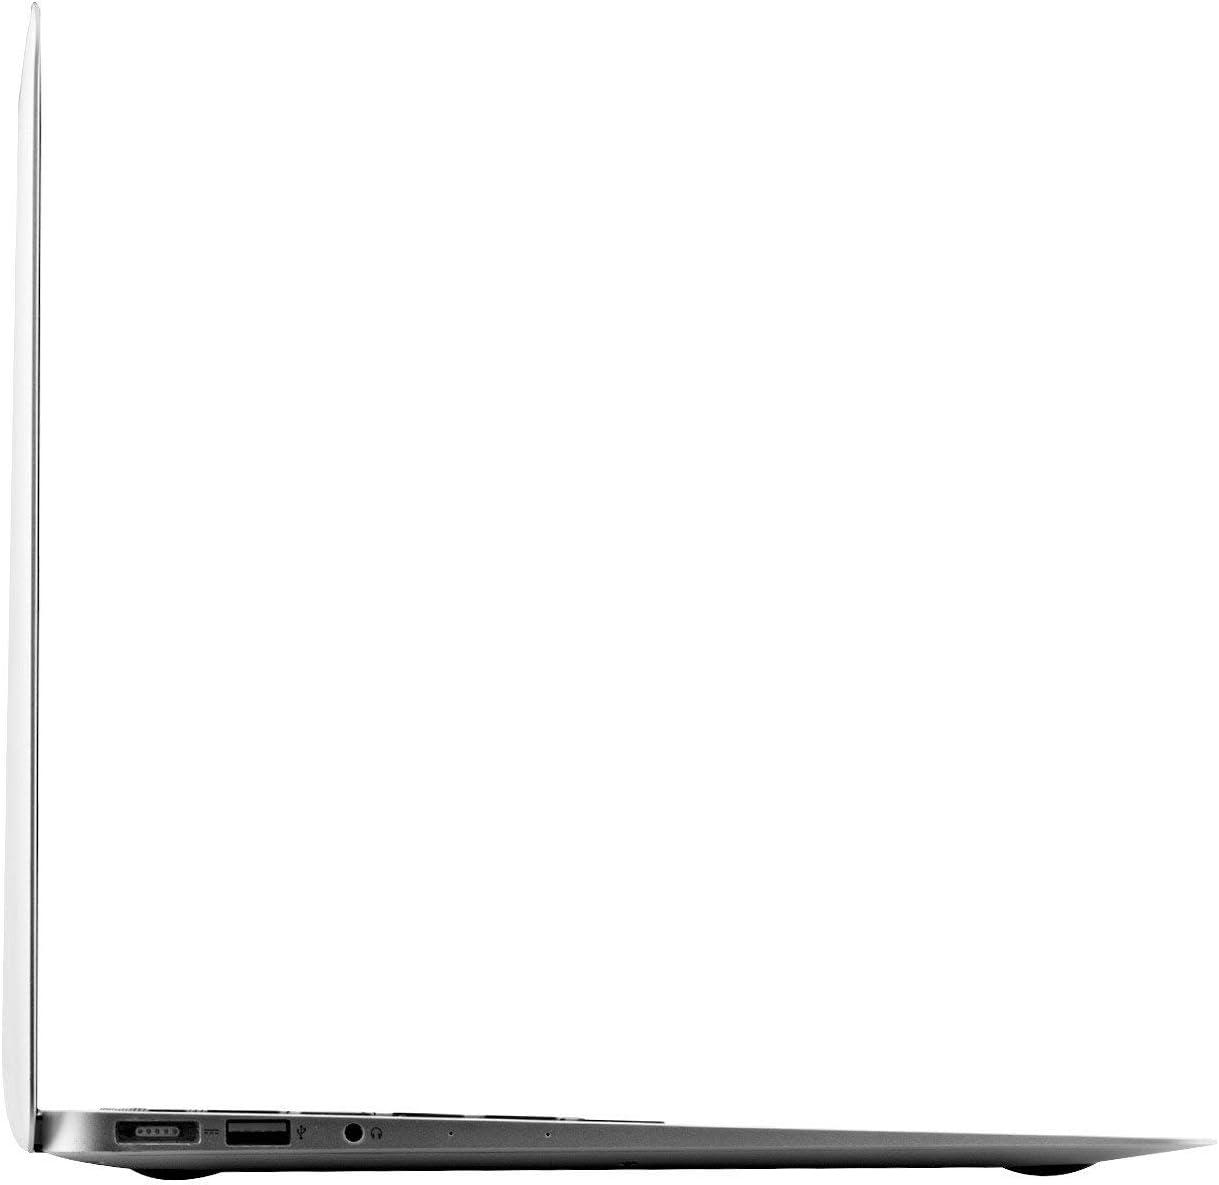 Apple MacBook Air MD760LL/A 13.3-Inch Laptop - 4GB RAM - 128GB SSD - 1.3GHz Core i5 (Renewed)